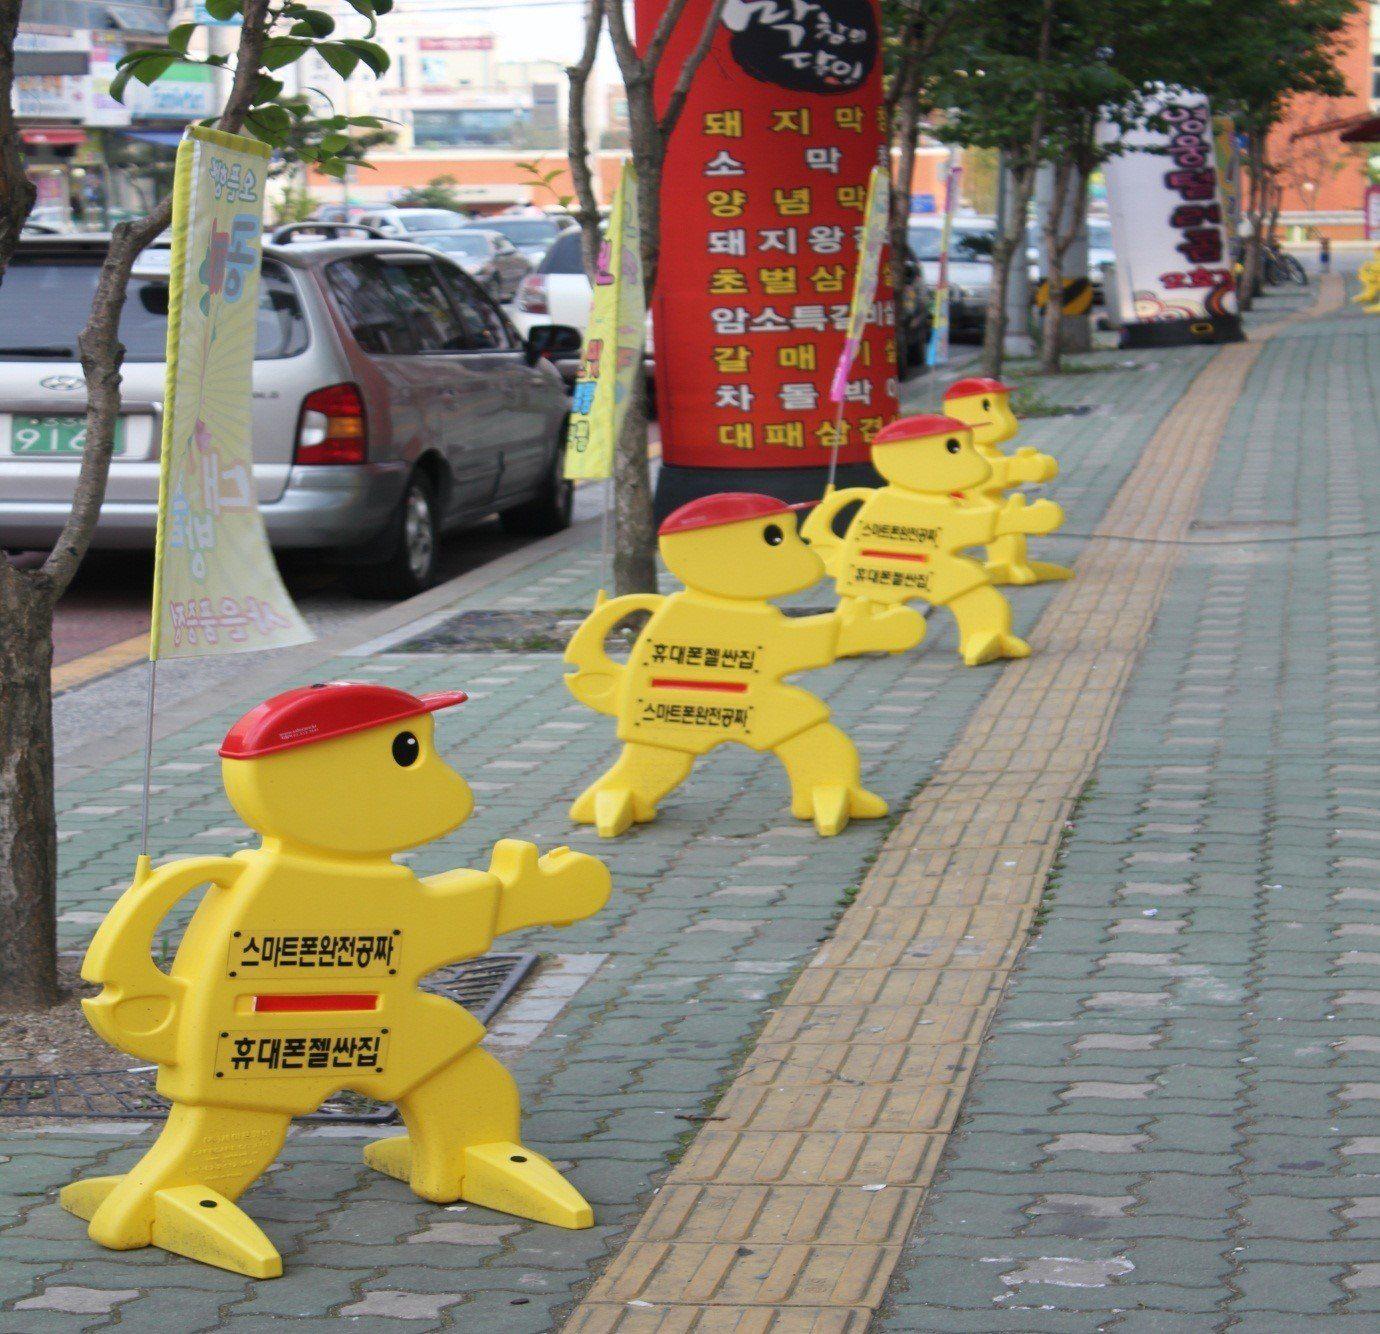 mobile phone shop plus internet korea